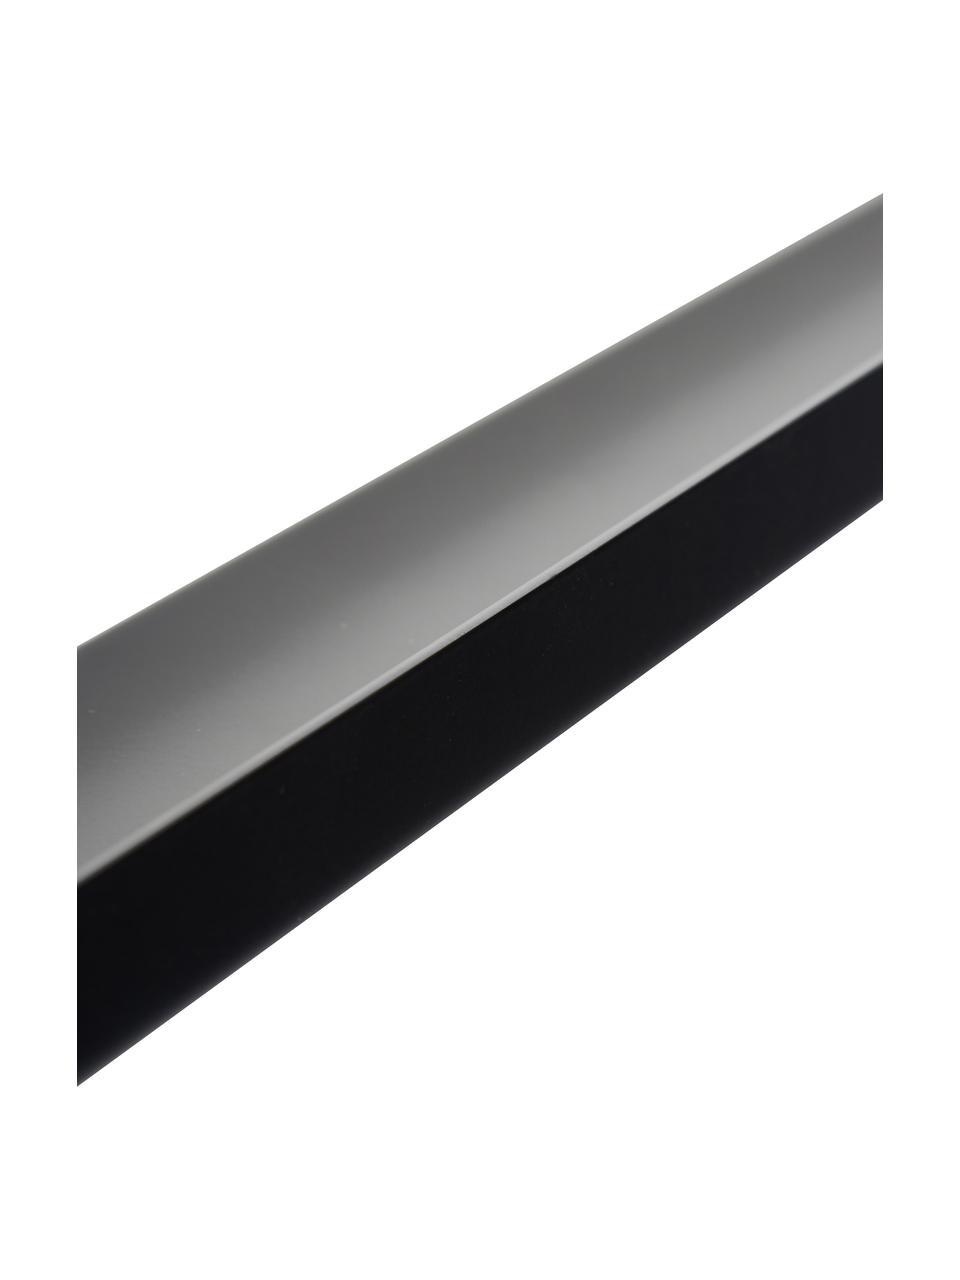 Schmale Bilderleiste Shelfini in Schwarz, Leiste: Metall, lackiert, Schwarz, Messing, 50 x 6 cm